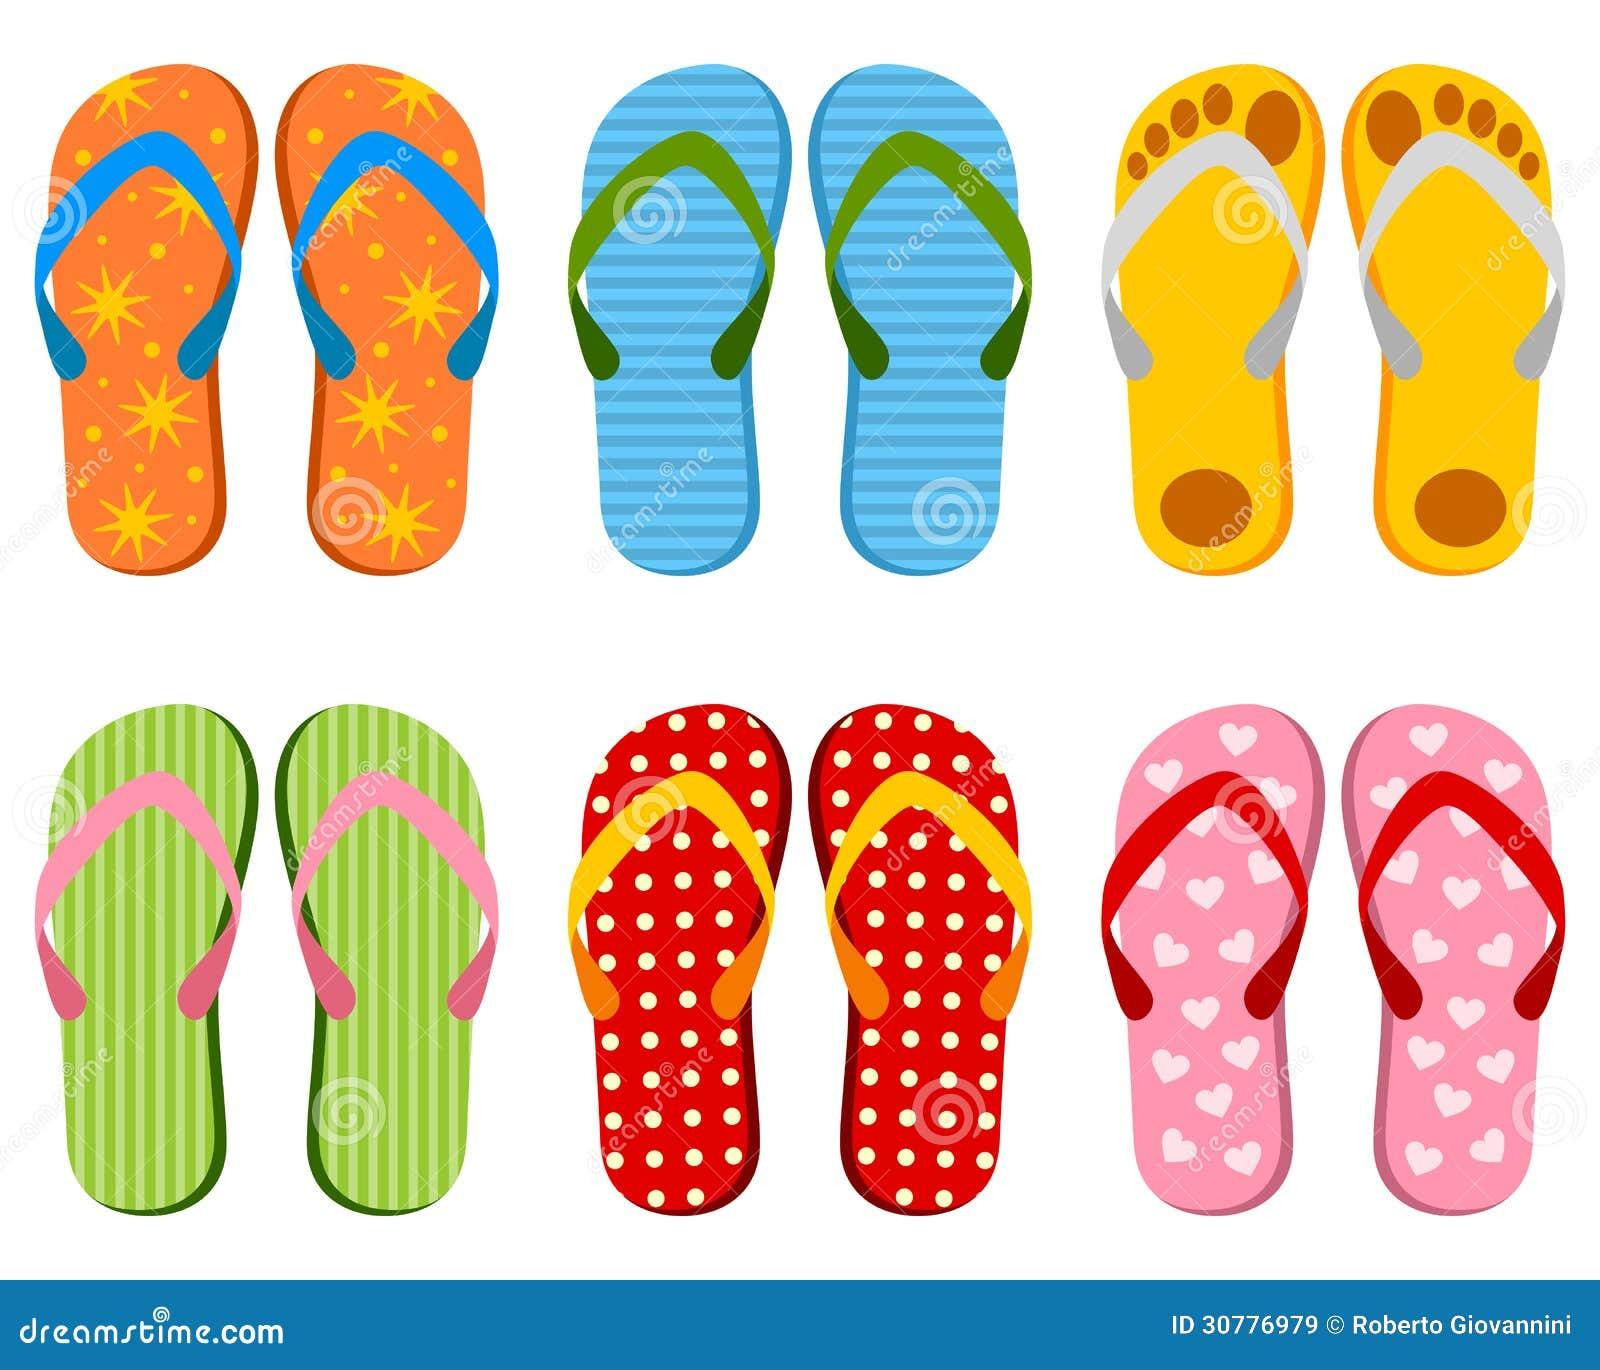 44ca0de86189 Colorful Flip Flops Collection Stock Vector - Illustration of shoes ...